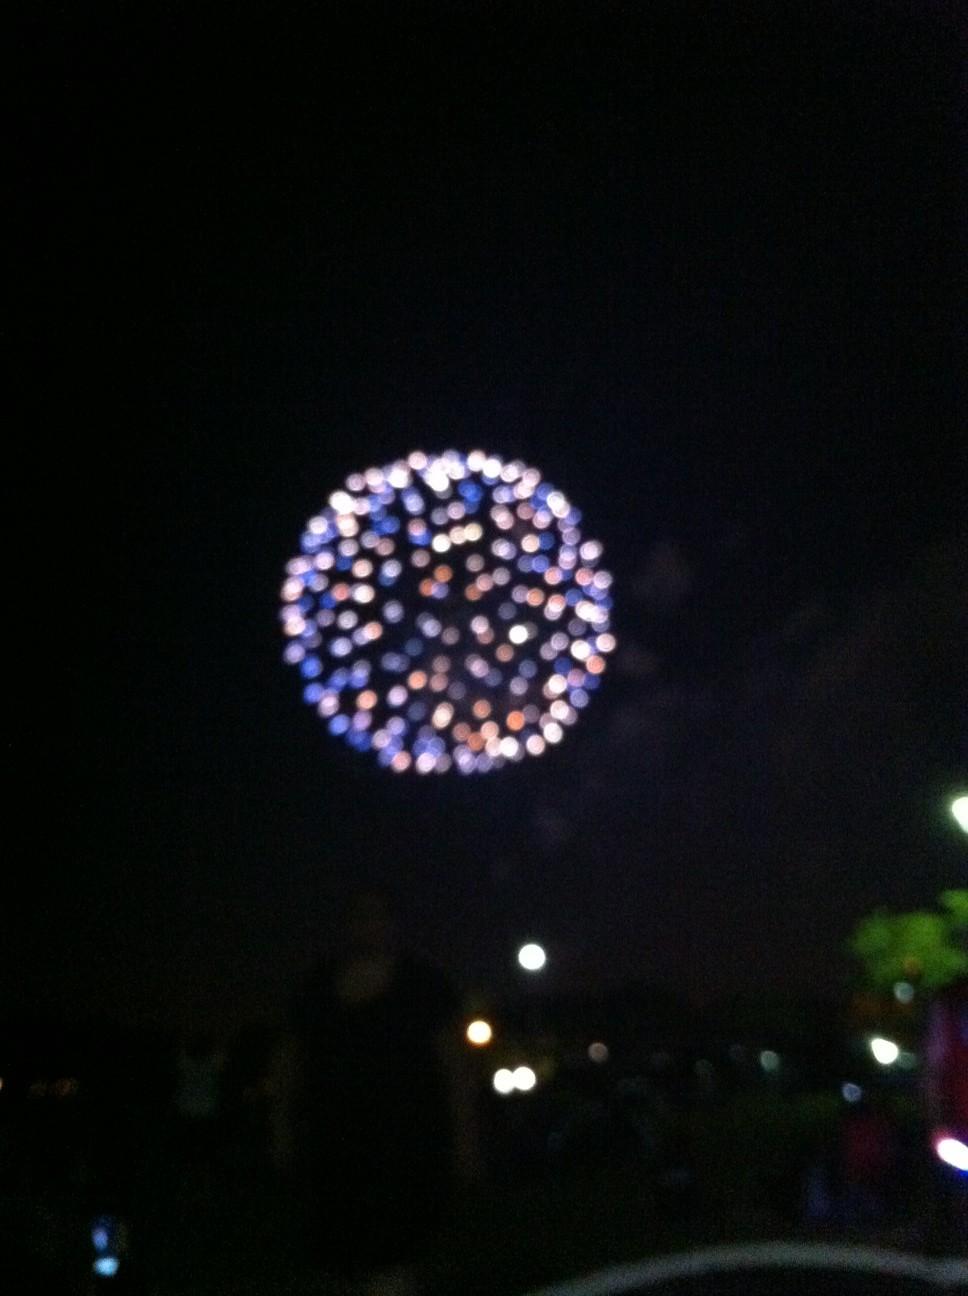 Yay fireworks!!!!! http://t.co/zBGi4ddC